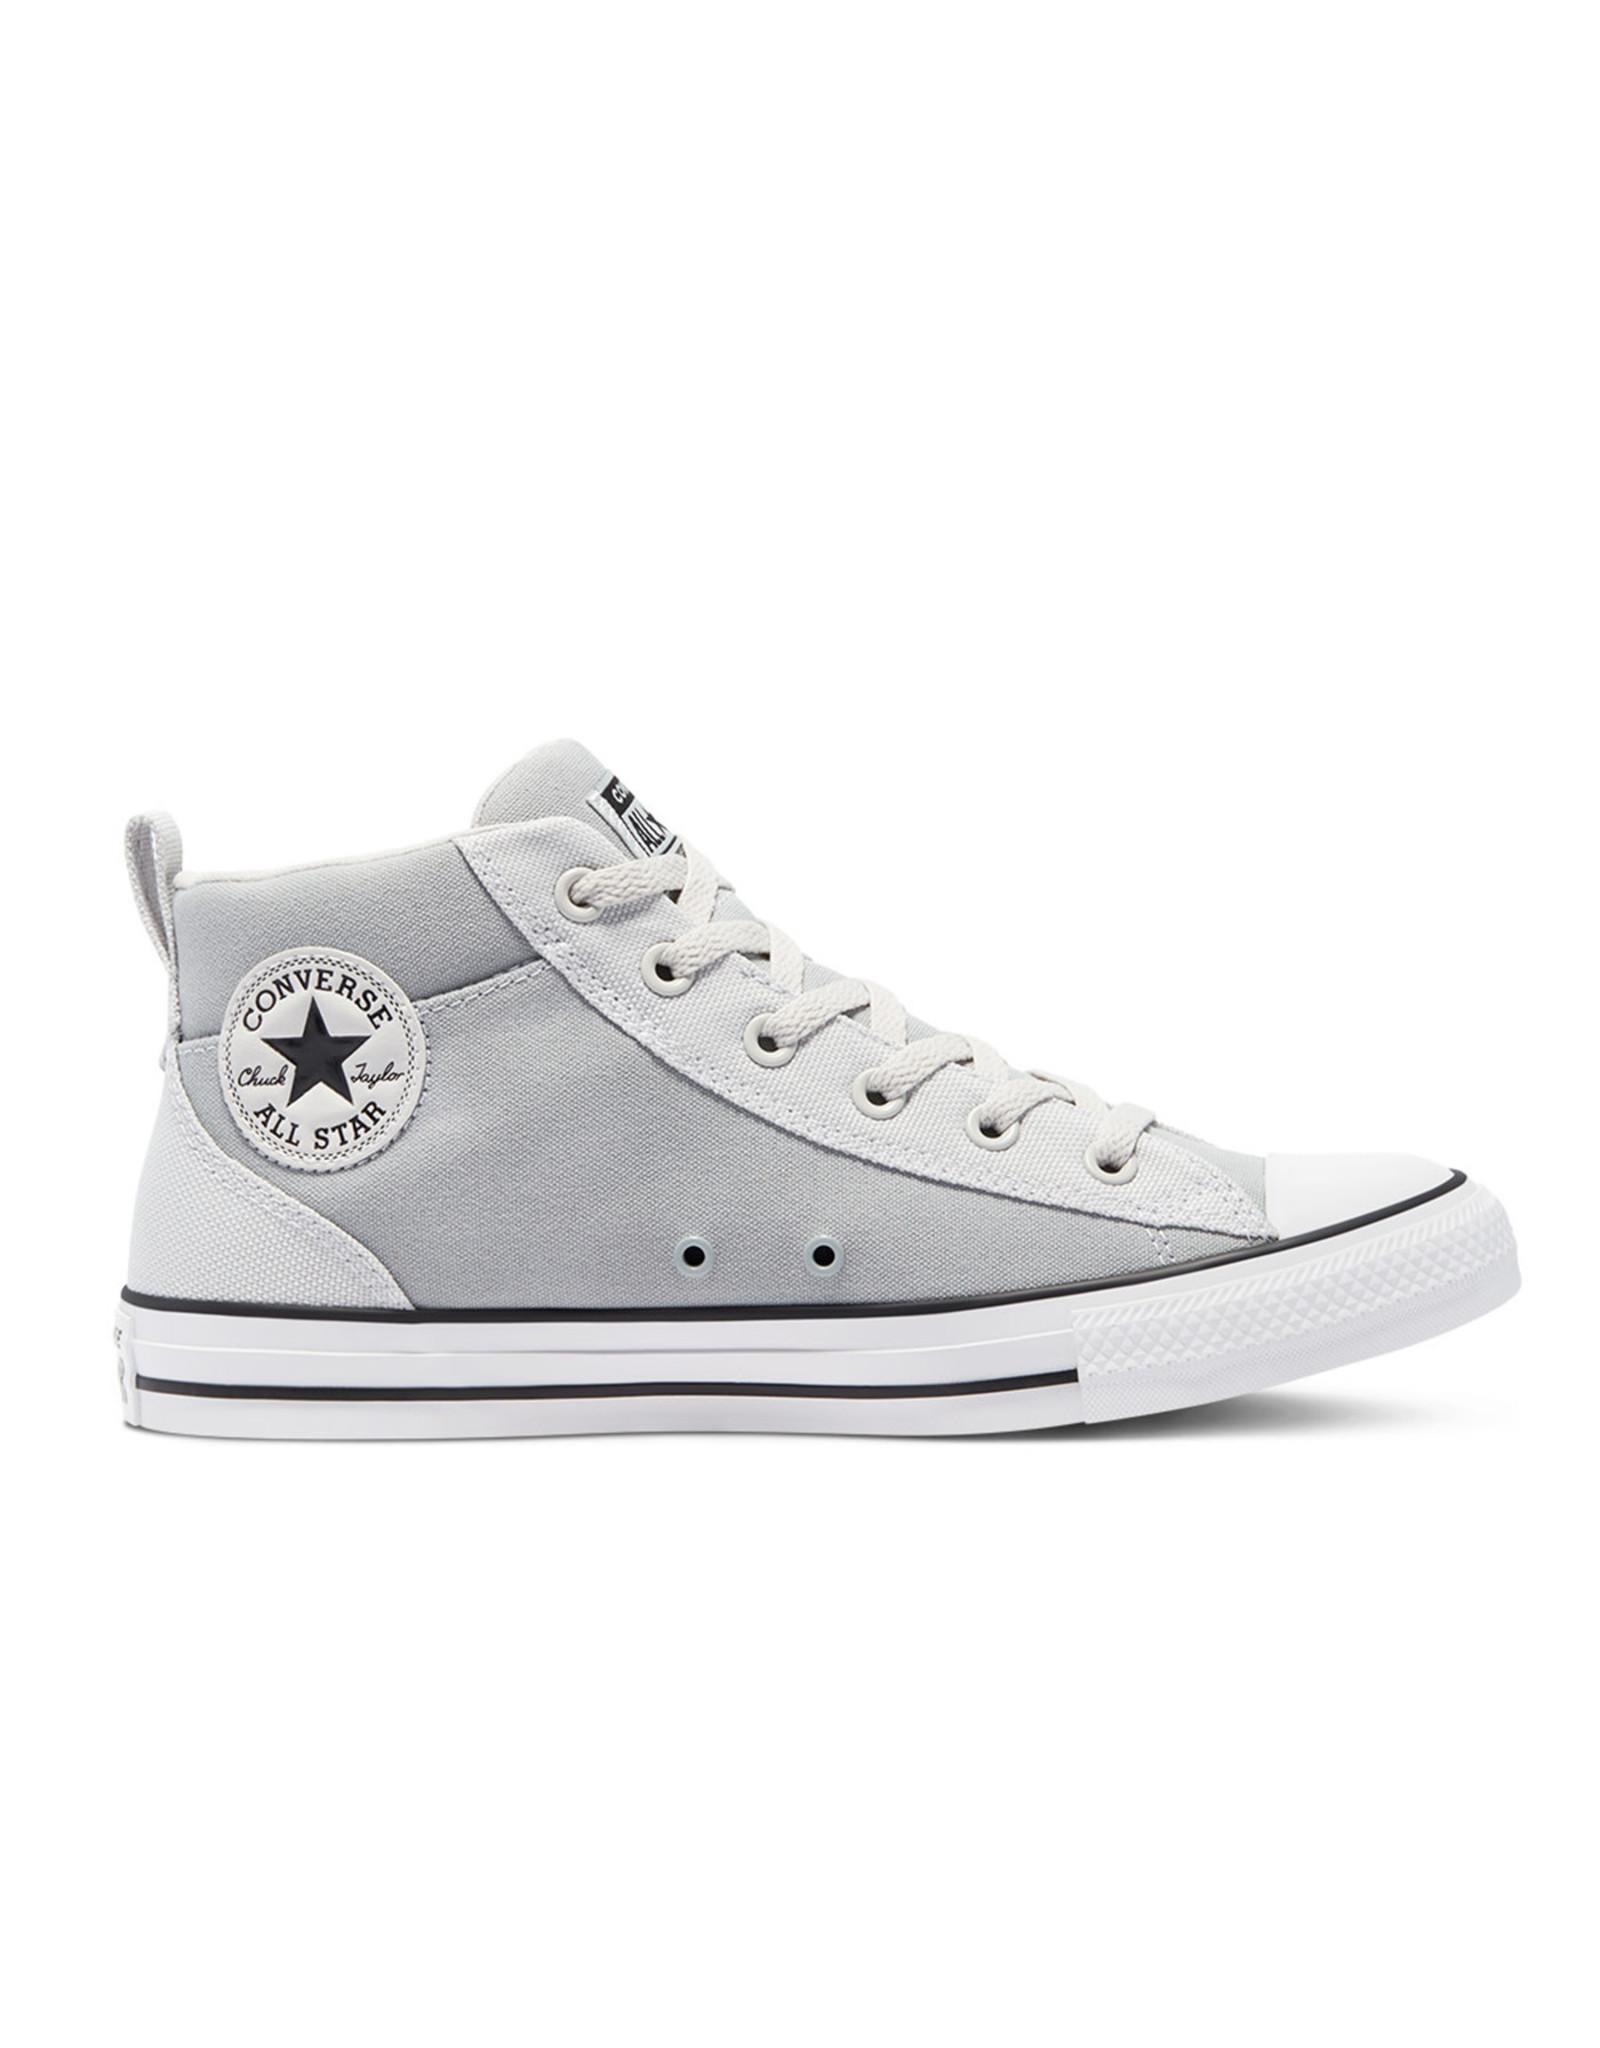 converse all star street mid